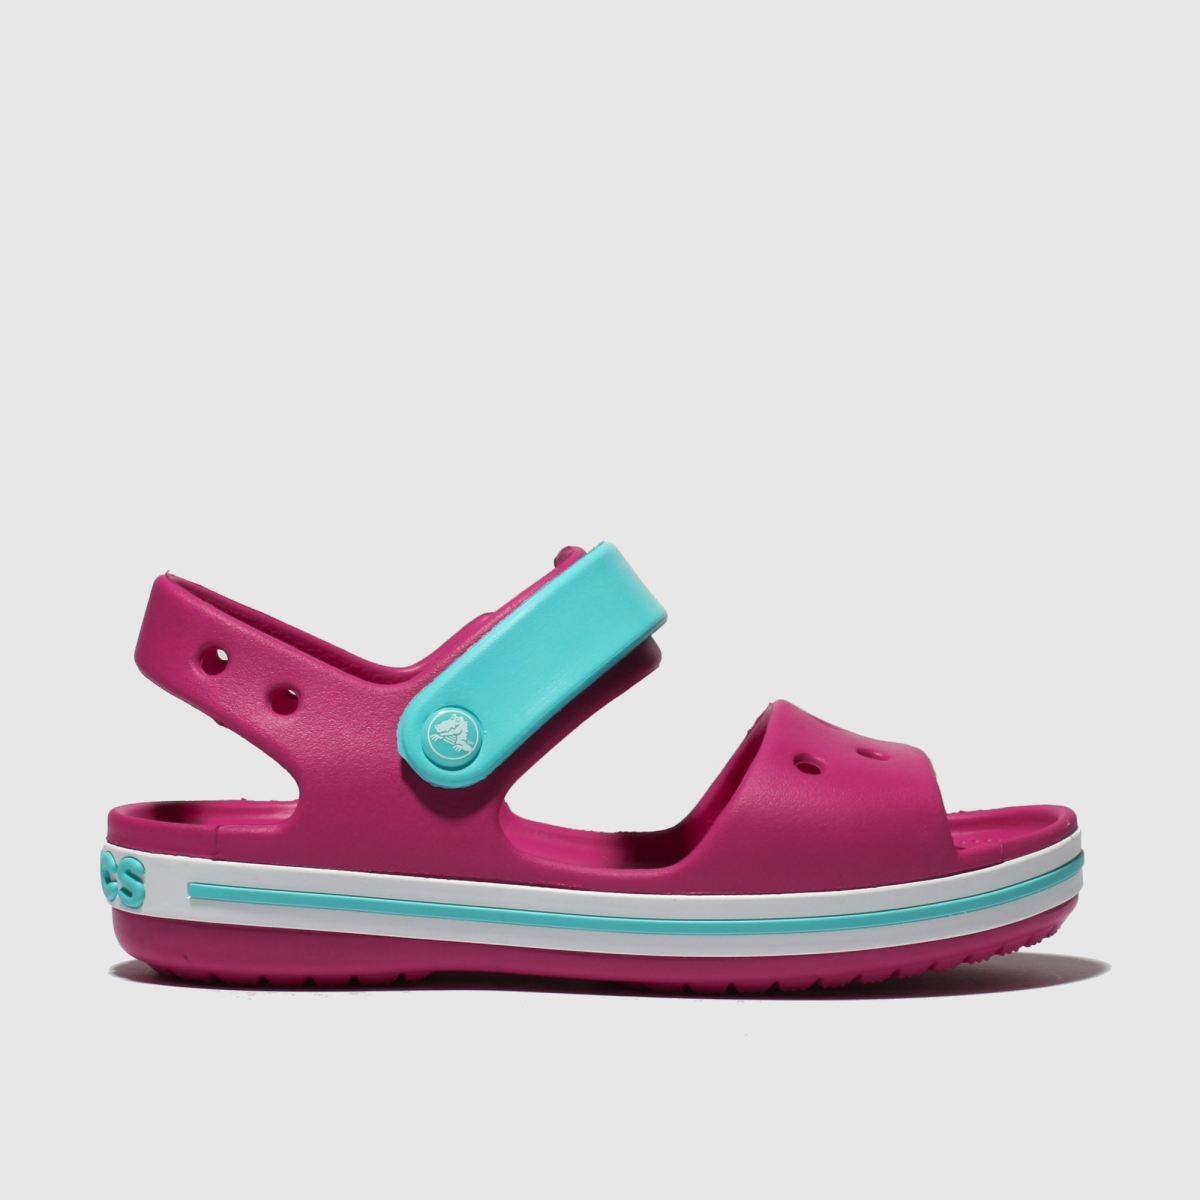 Crocs Pink Crocband Sandal Sandals Junior